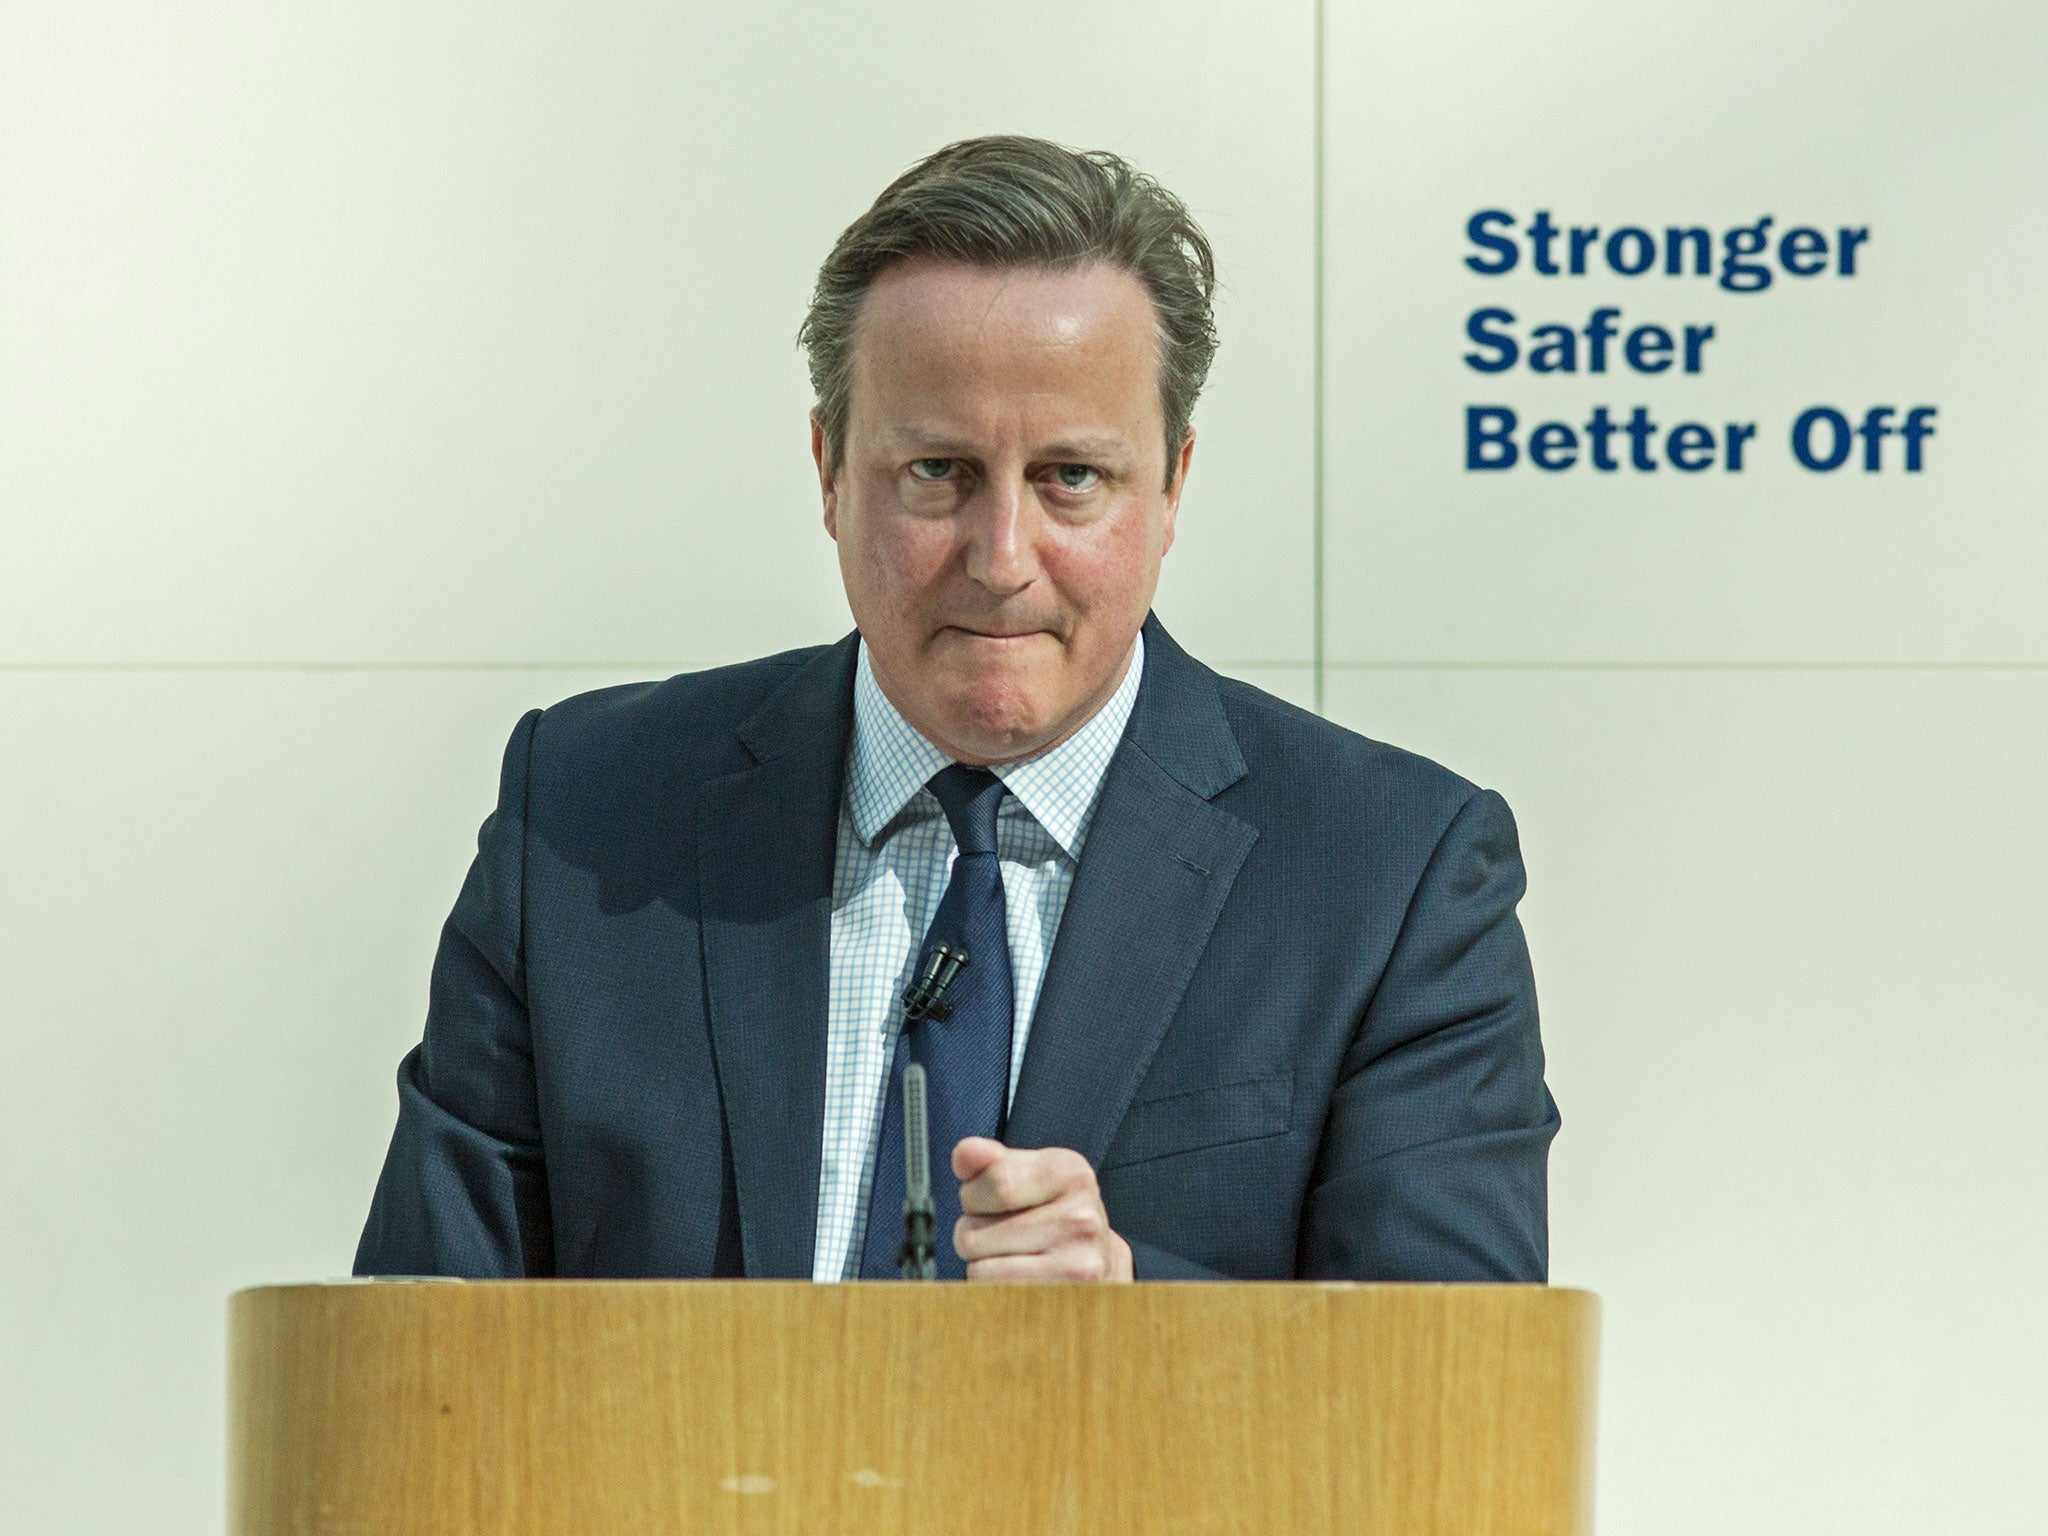 David cameron eu referendum betting football results and betting odds